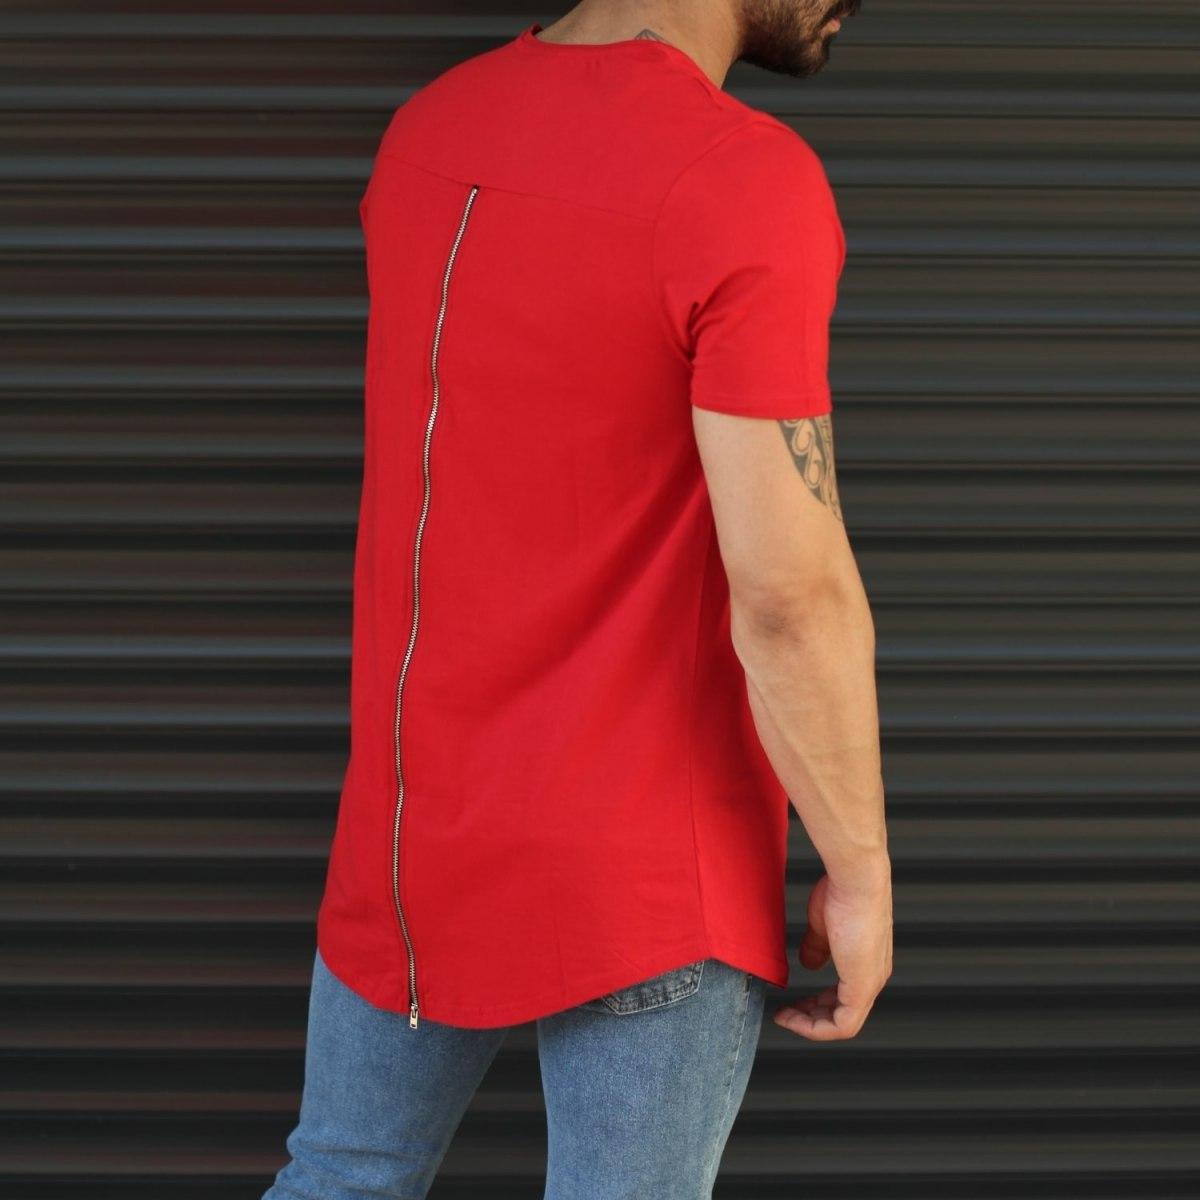 Men's Longline Back-Zipper T-Shirt In Red Mv Premium Brand - 3